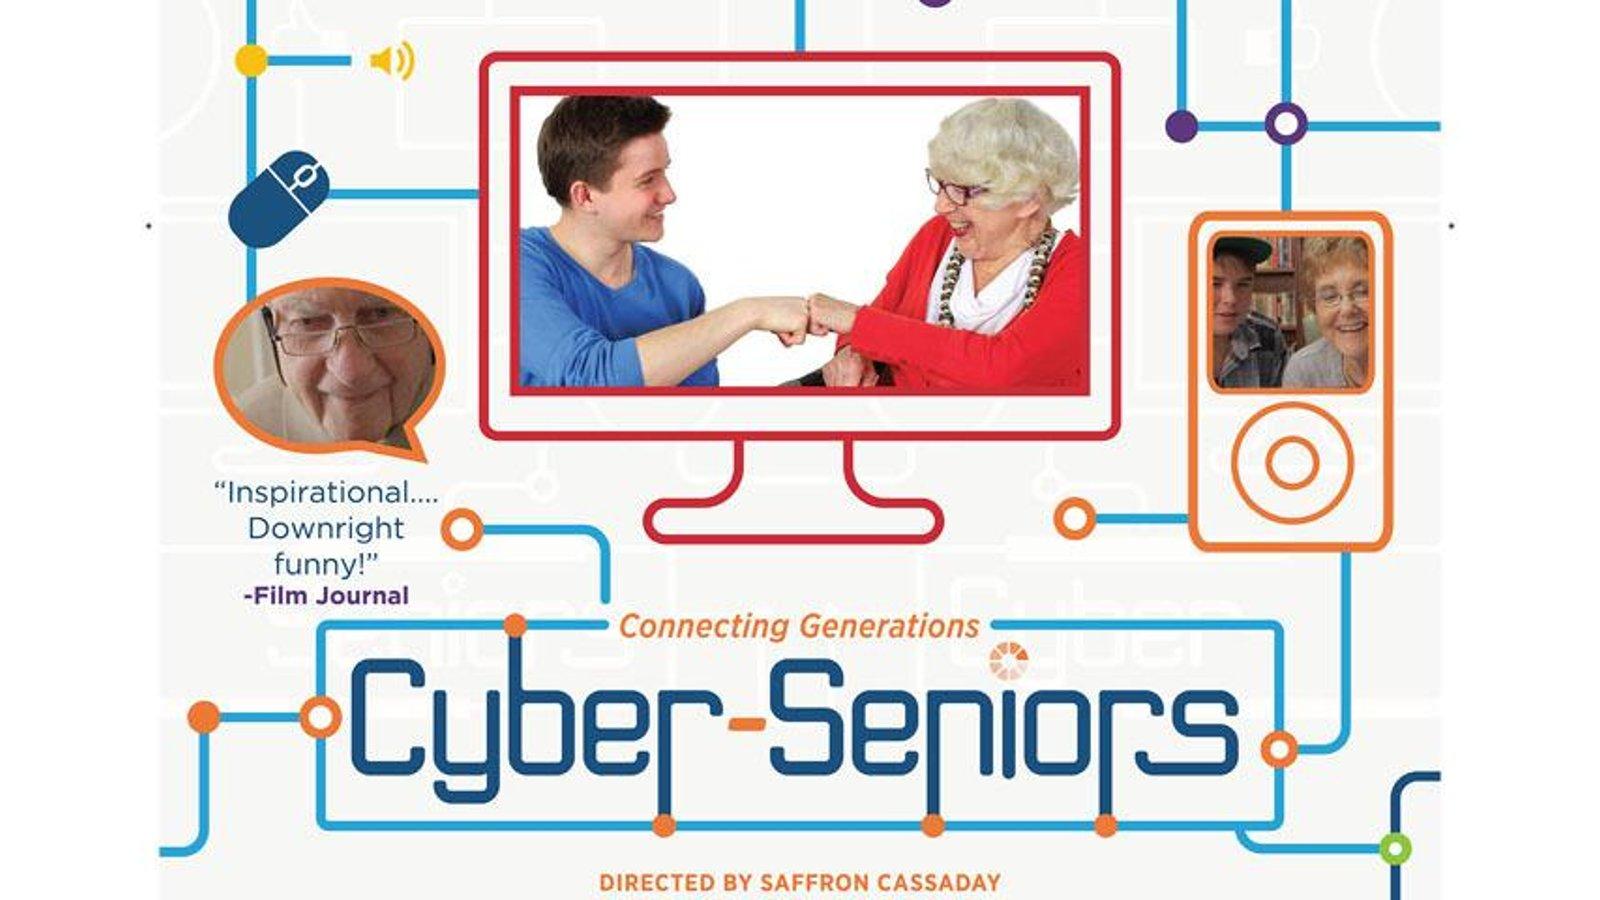 Cyber-Seniors - Teenagers Helping Seniors Use the Internet